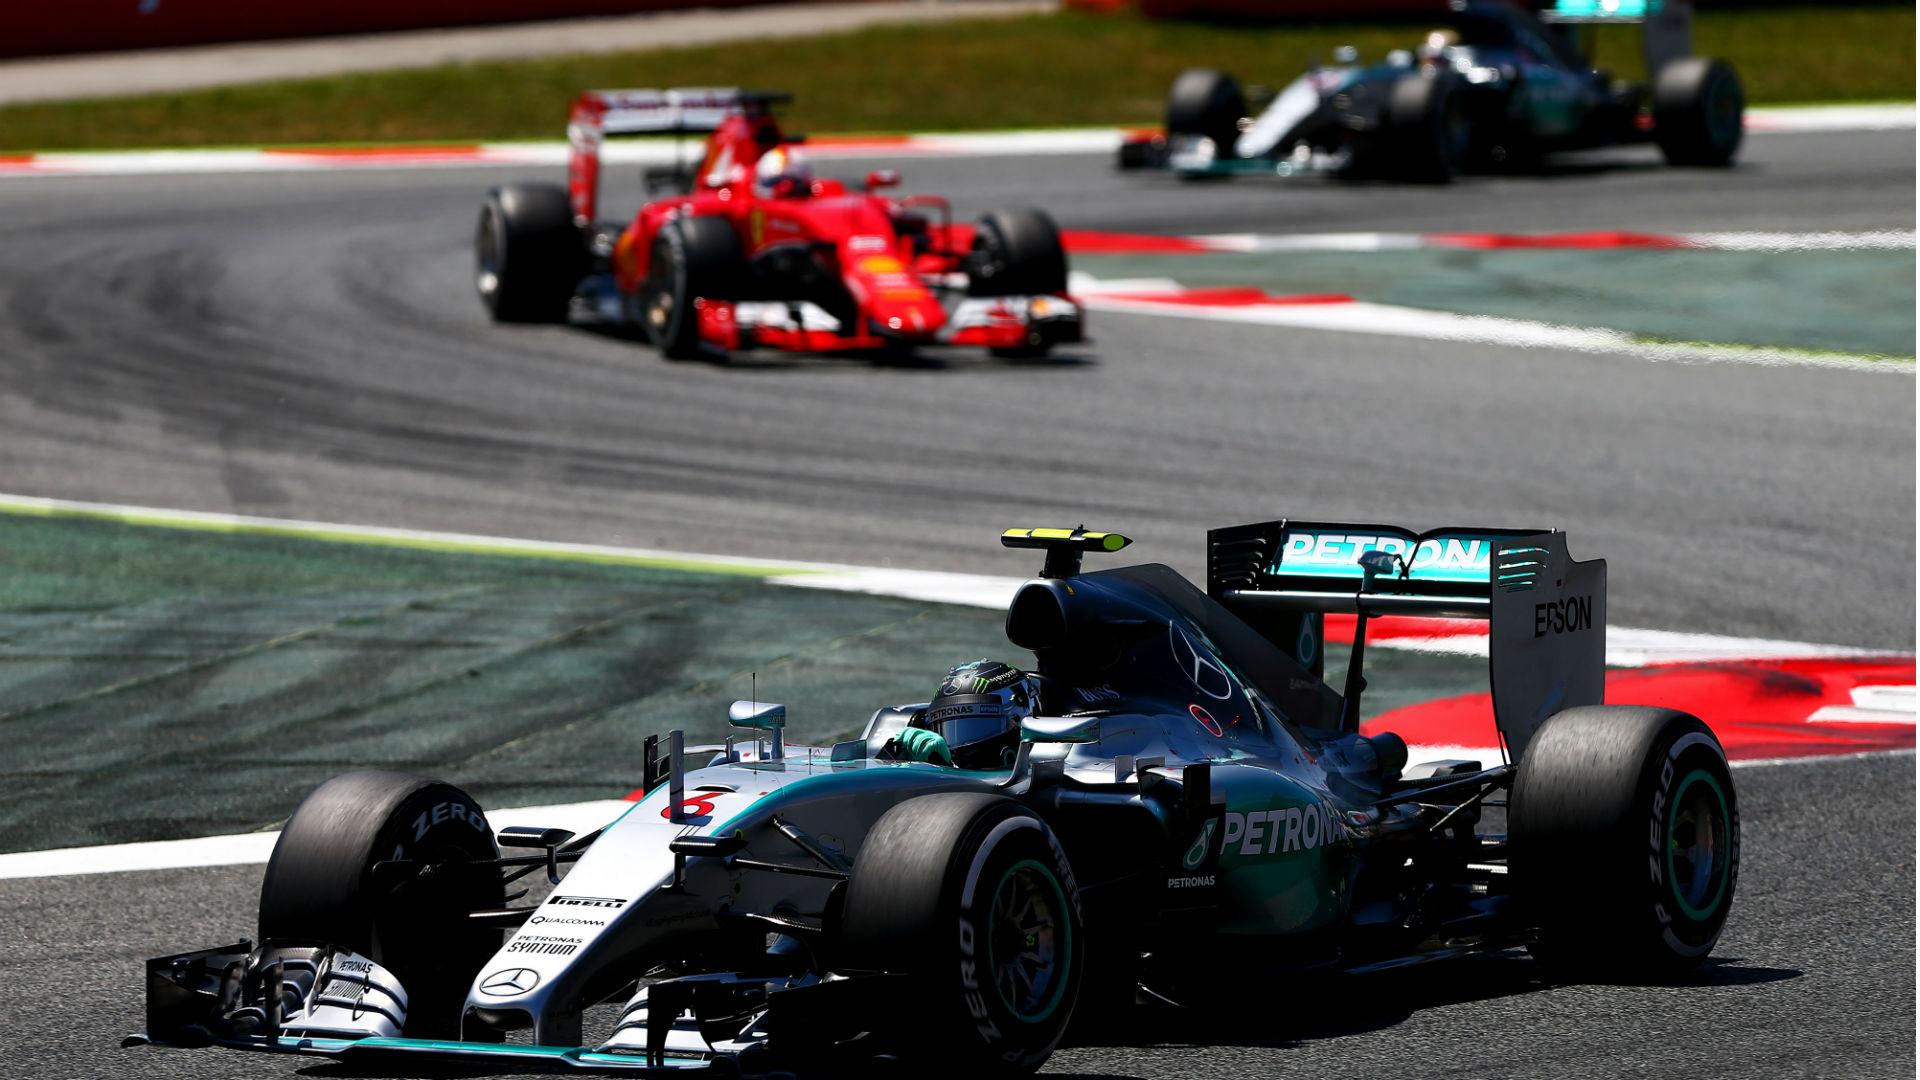 Motorsport | F1, V8 Supercars, MotoGP, Superbikes | SPORTAL